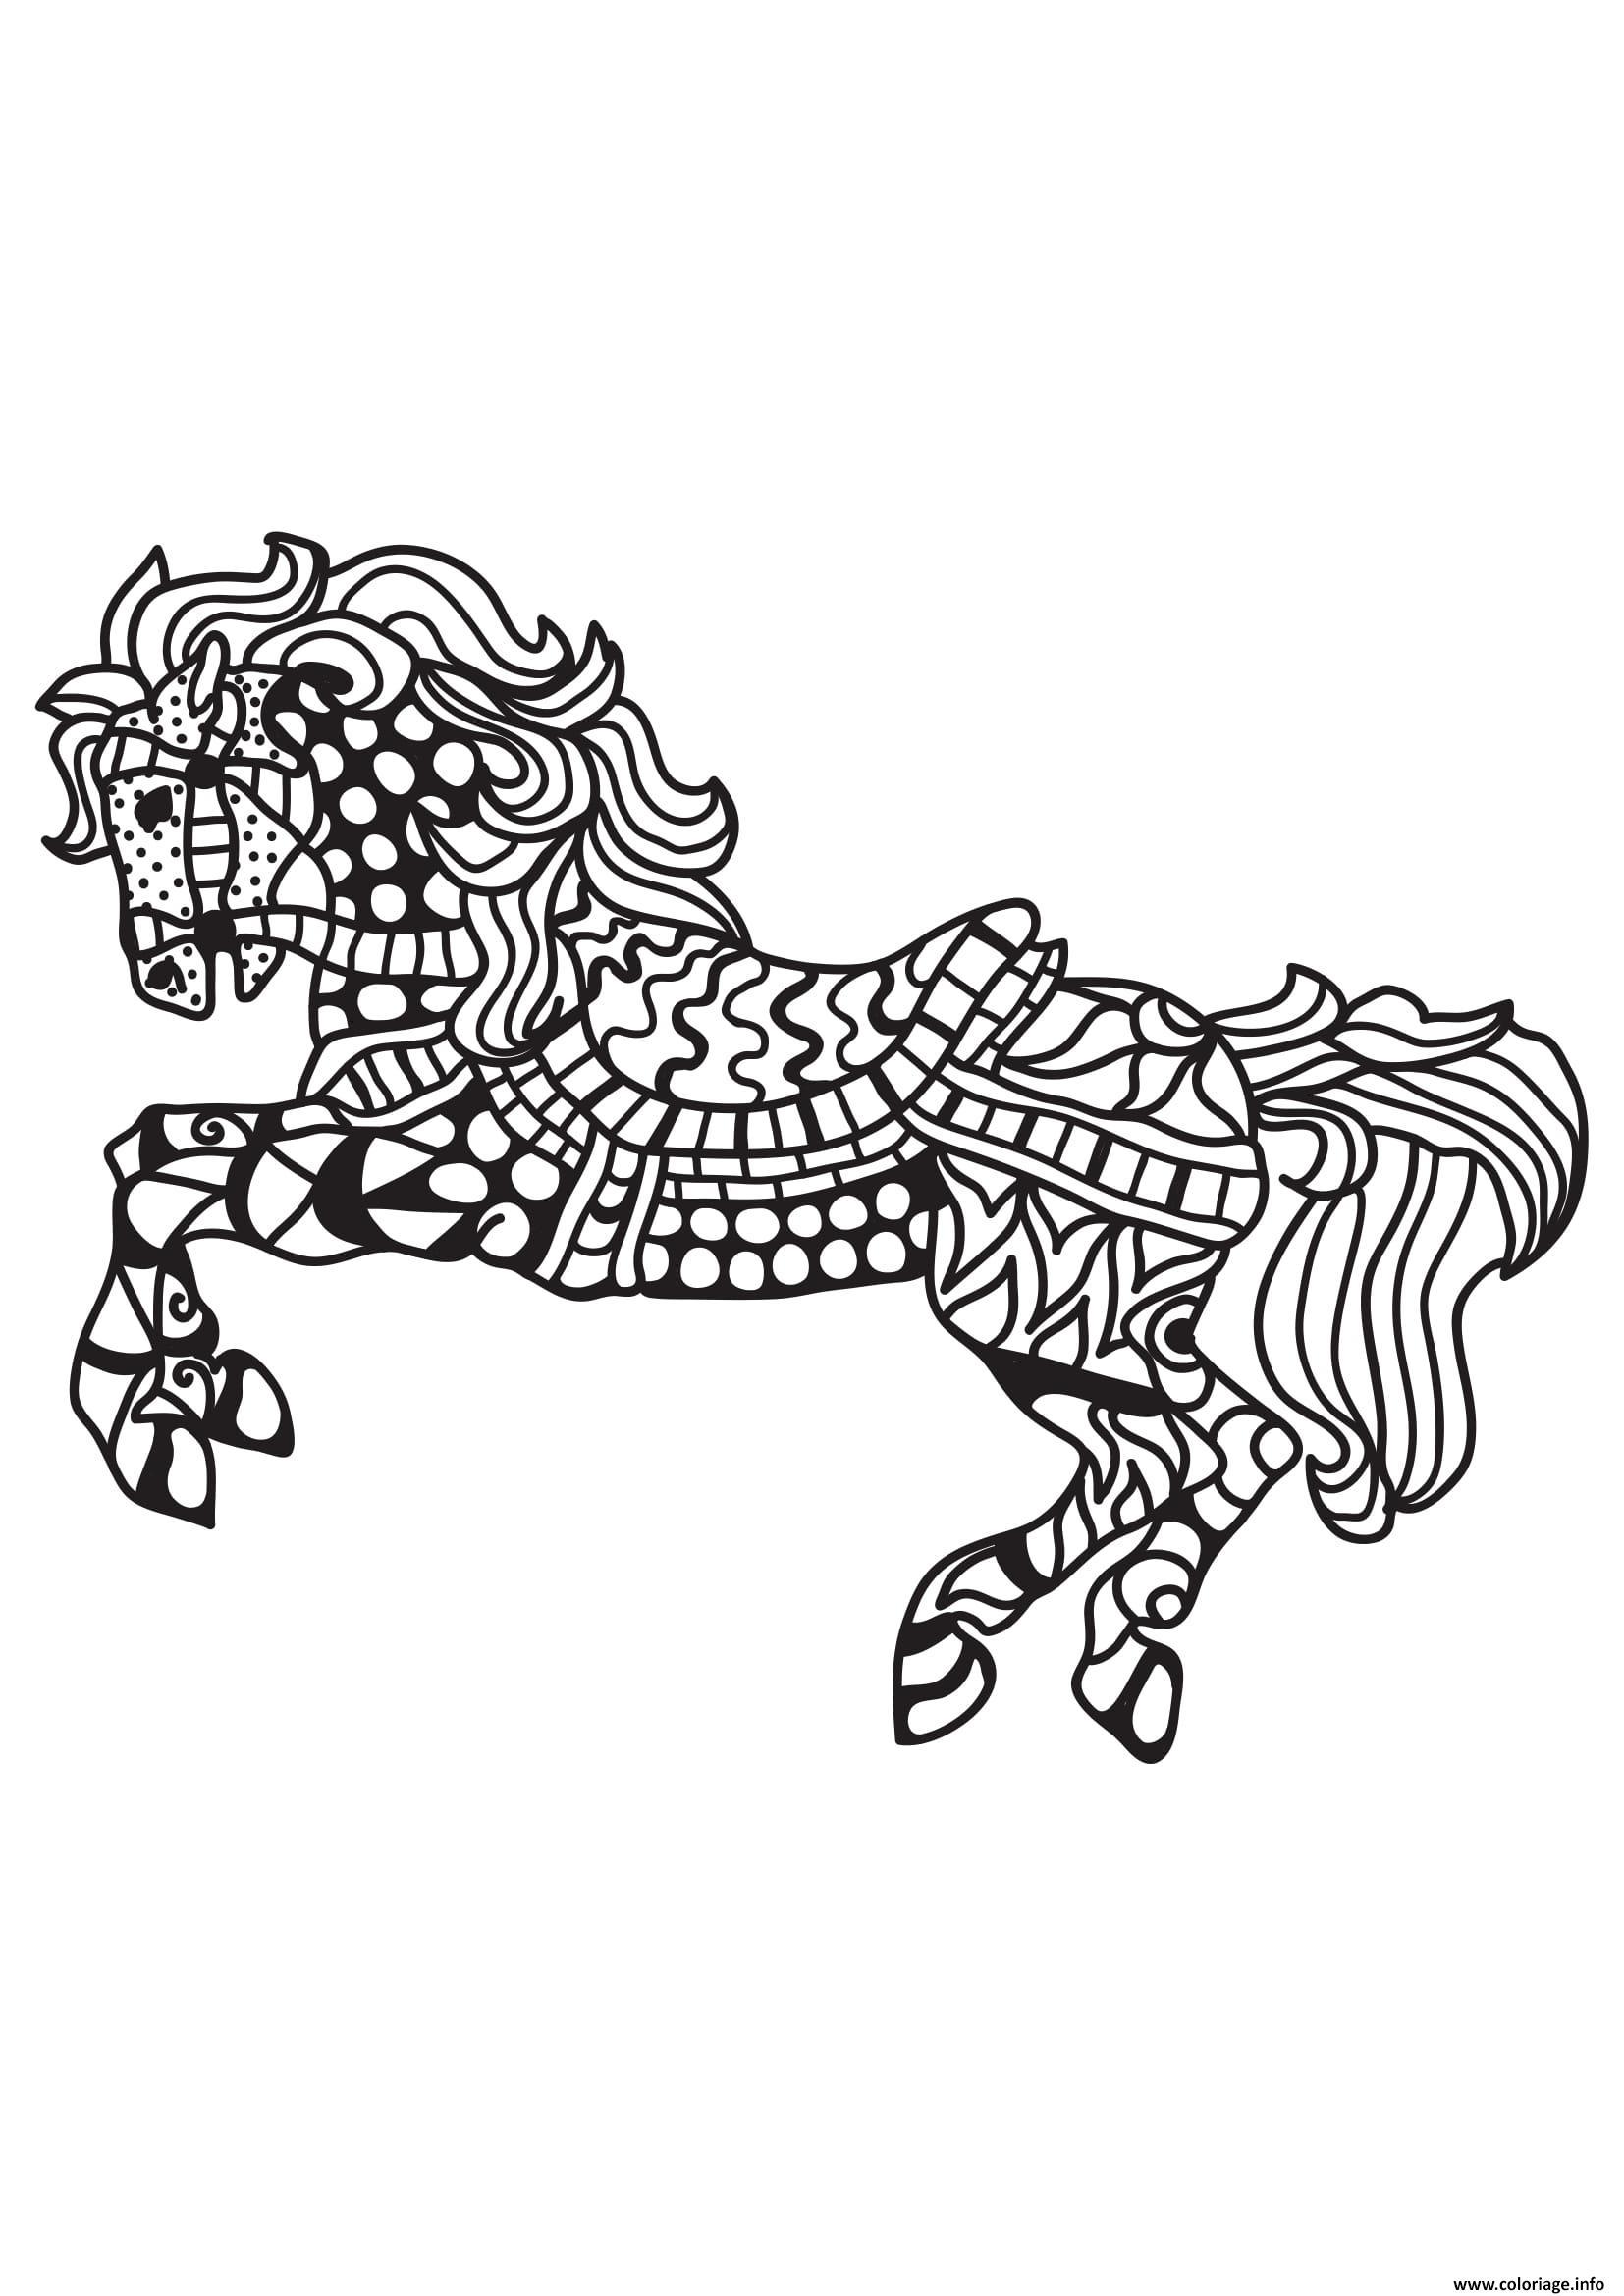 Inspirant dessin a colorier mandala cheval - Coloriage chevaux ...